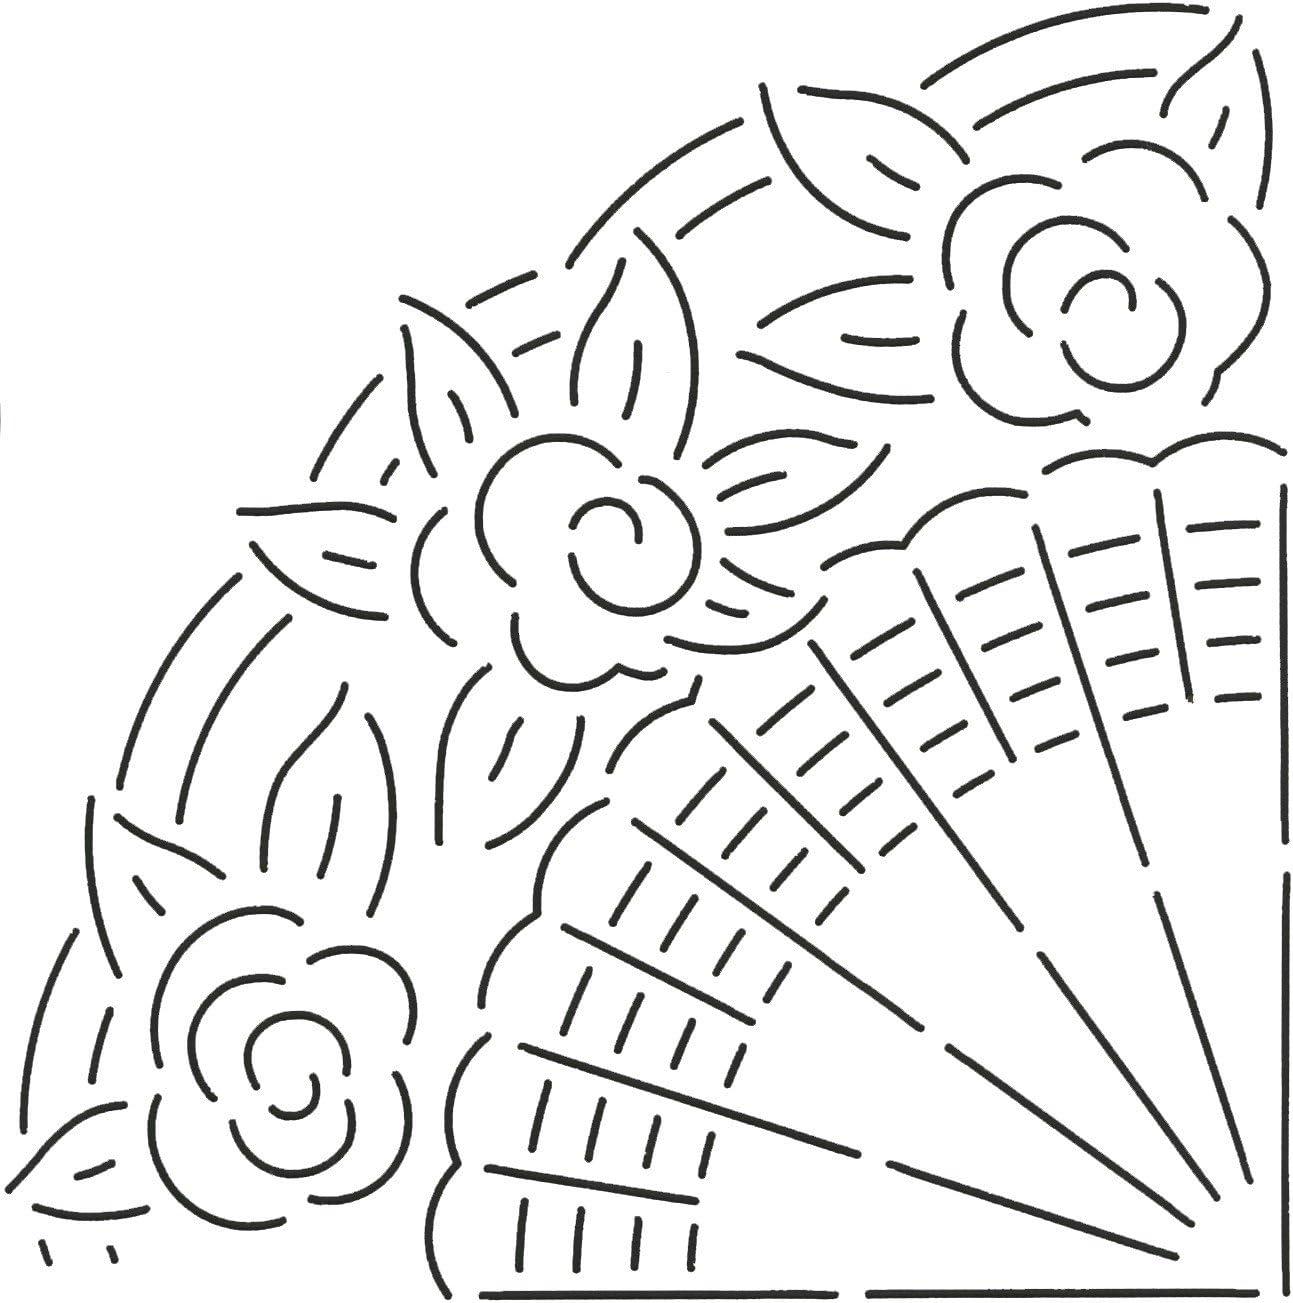 Quilting Creations Fan Design Stencil Quilt Genuine Max 87% OFF